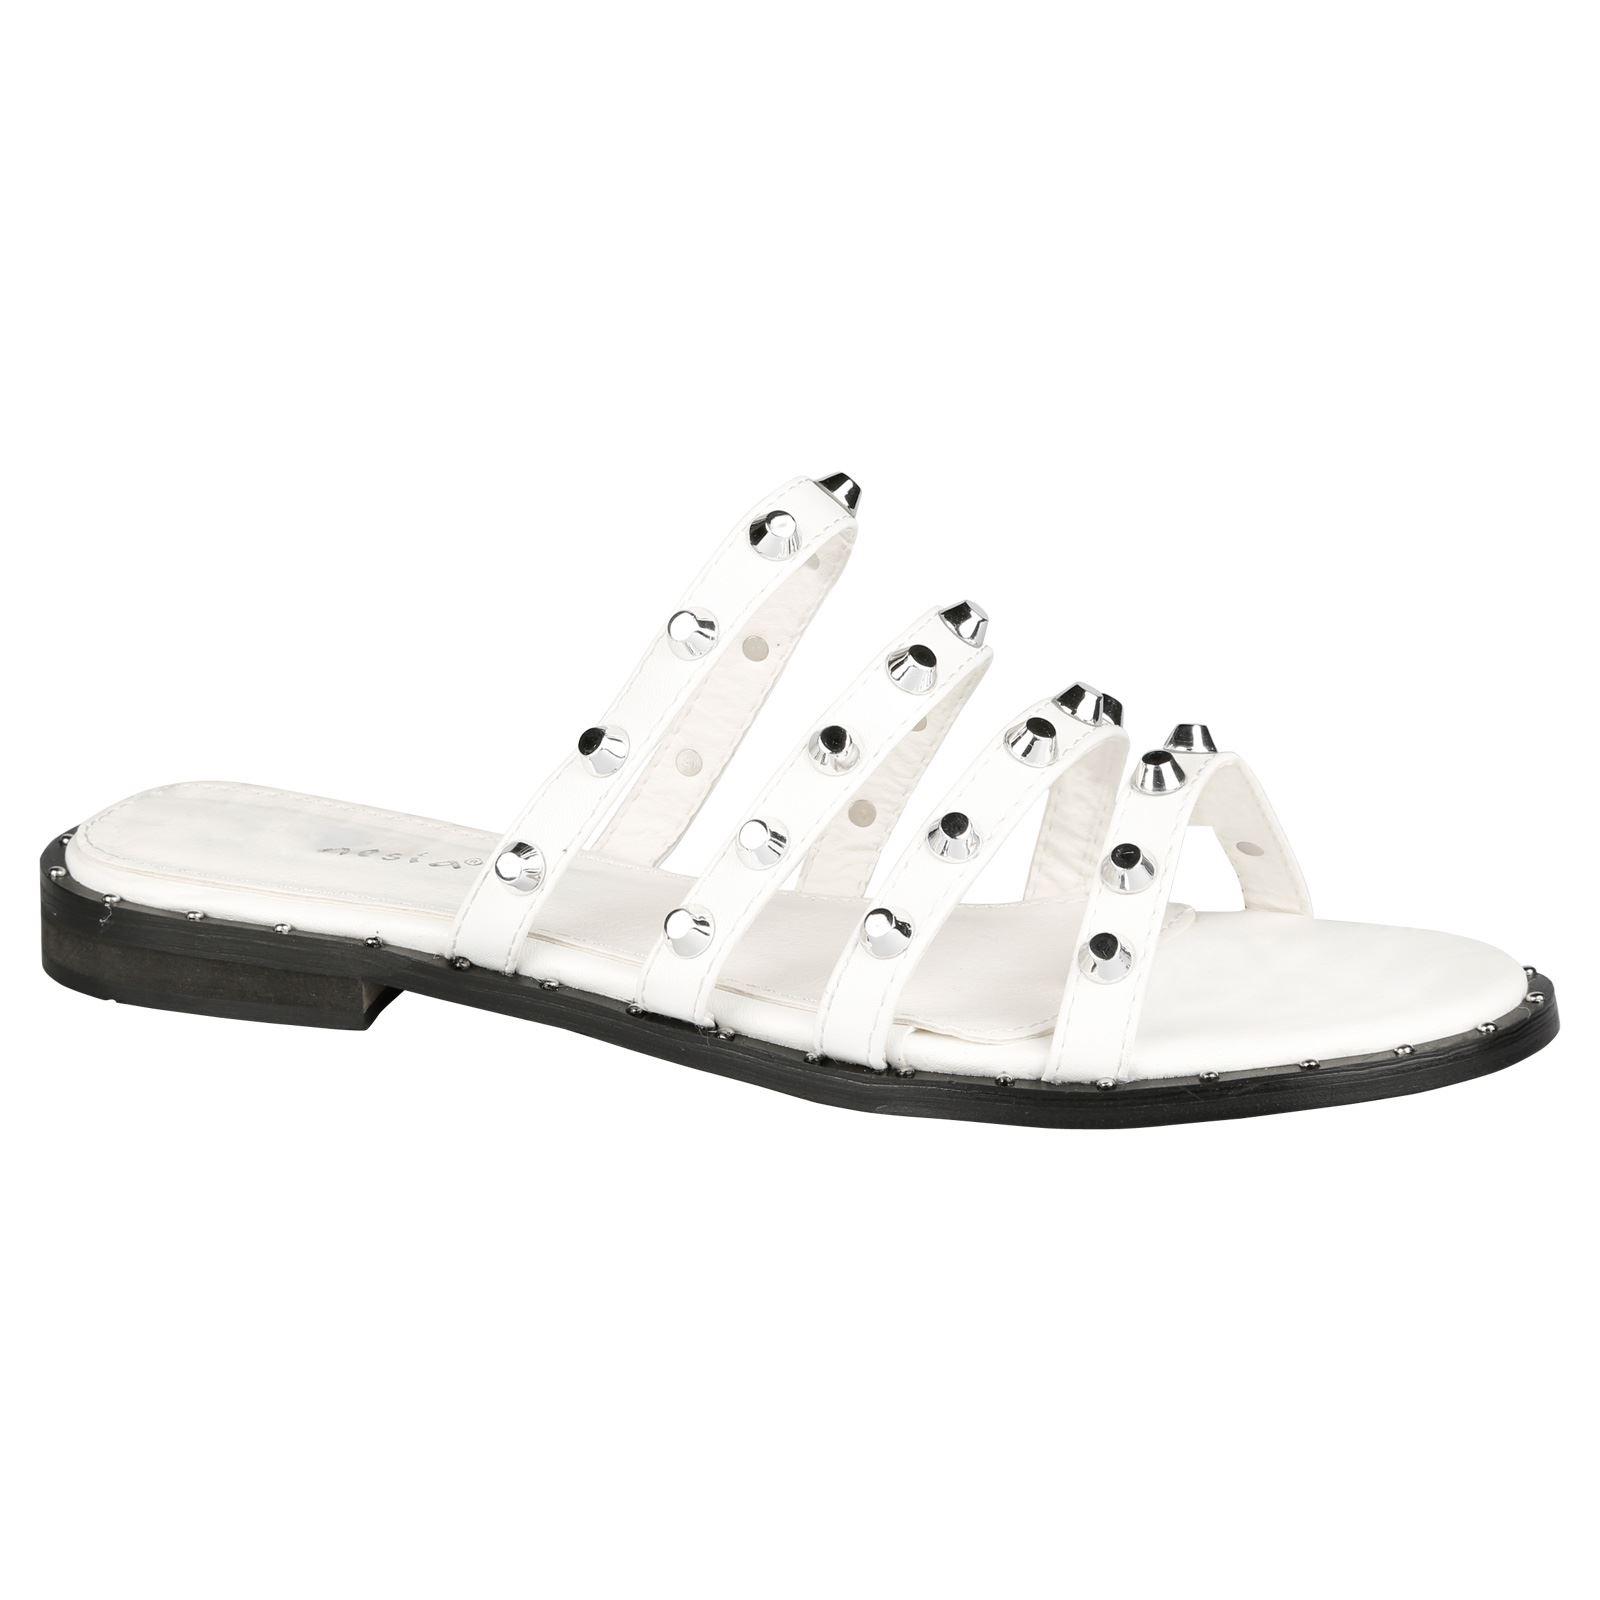 a481b988fda4 Vita Womens Flats Low Heels Slip On Studded Sandals Ladies Sliders Open Toe  Size  Picture 2 of 5 ...